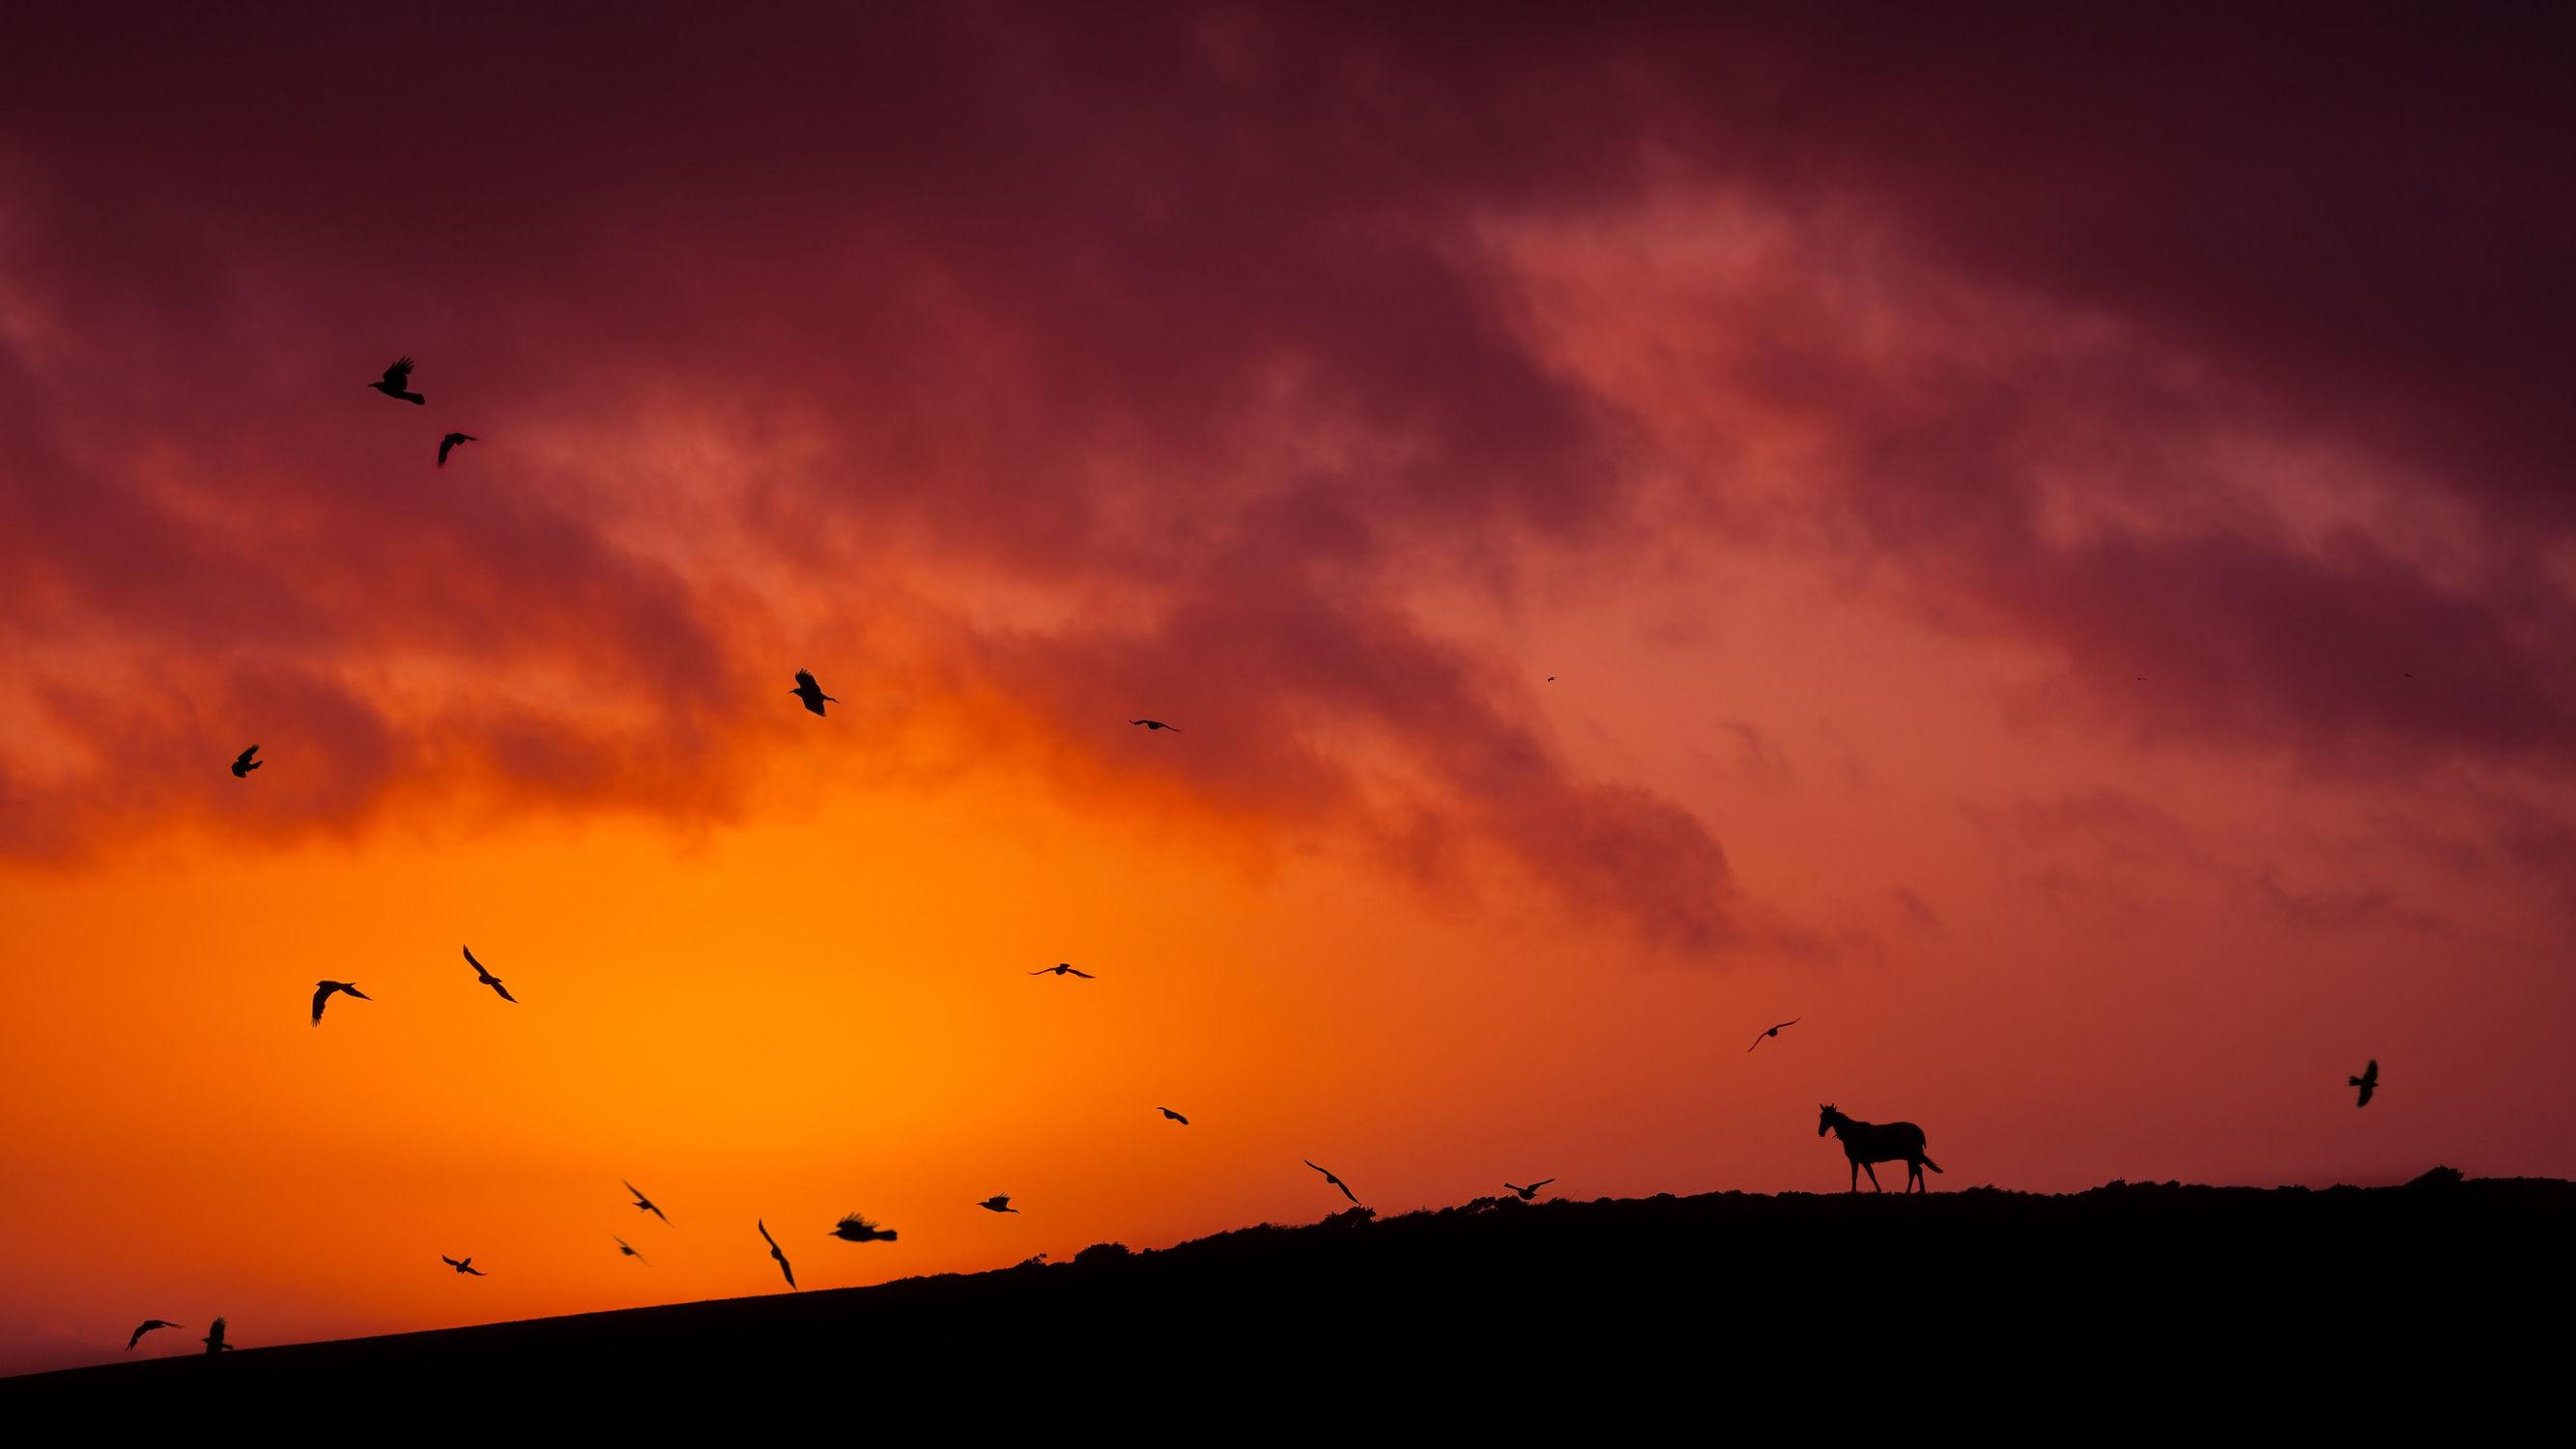 Bild mit Tiere, Natur, Sonnenuntergang, Sonnenaufgang, Sonne, Pferde, Pferde, Landschaft, Tier, Kinderbild, Kinderbilder, Feld, Pferd, Pferd, Felder, Wiesen, reiten, Pferdeliebe, pferdebilder, pferdebild